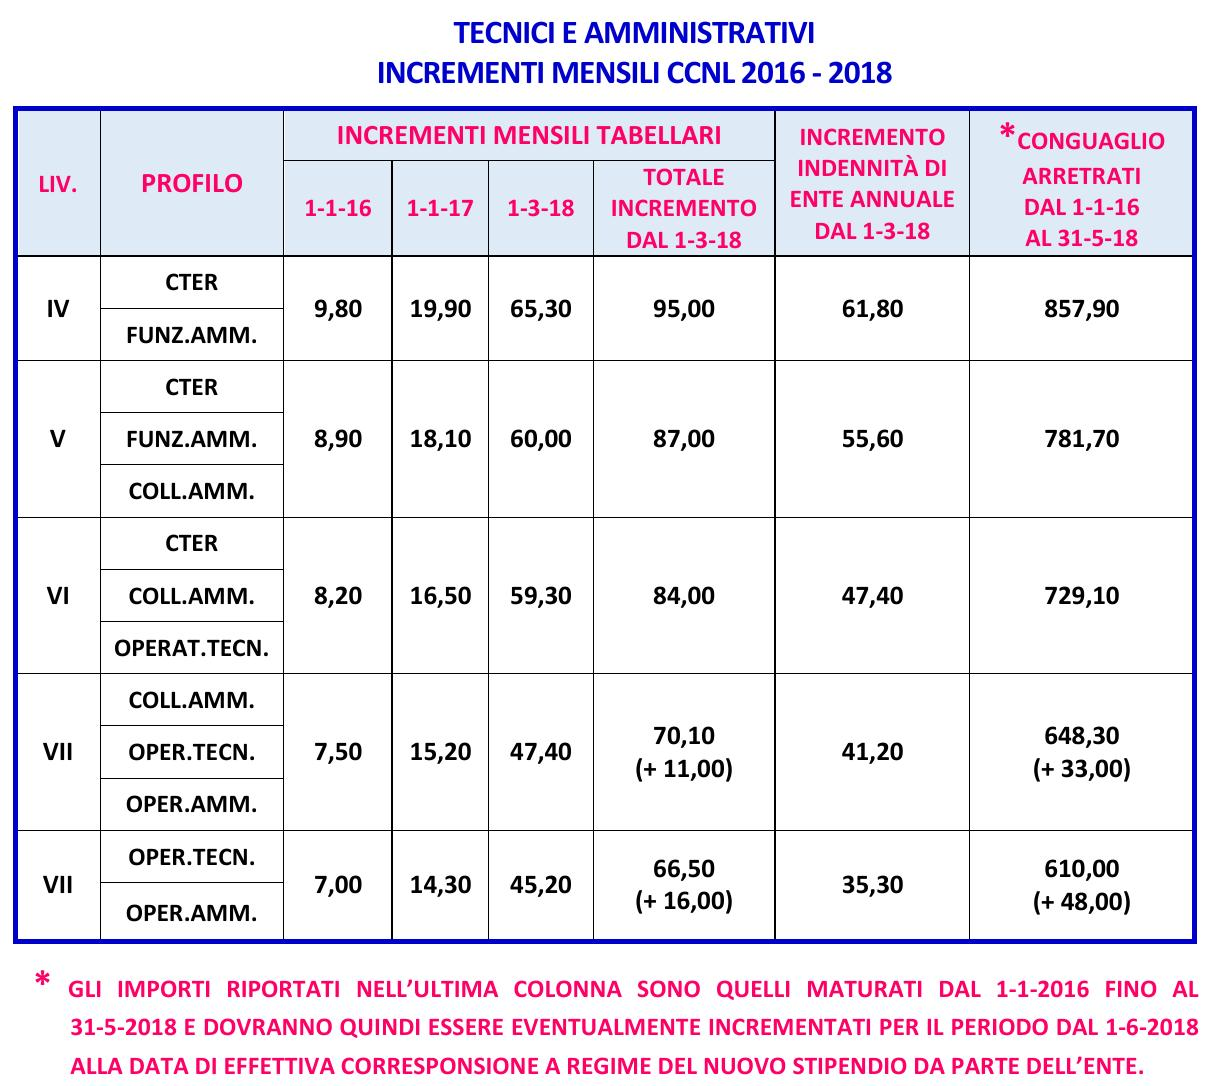 autentico grande qualità varietà larghe 5_com UIL RUA 20-2-2018 - Rinnovo CCNL | blog.imm.cnr.it